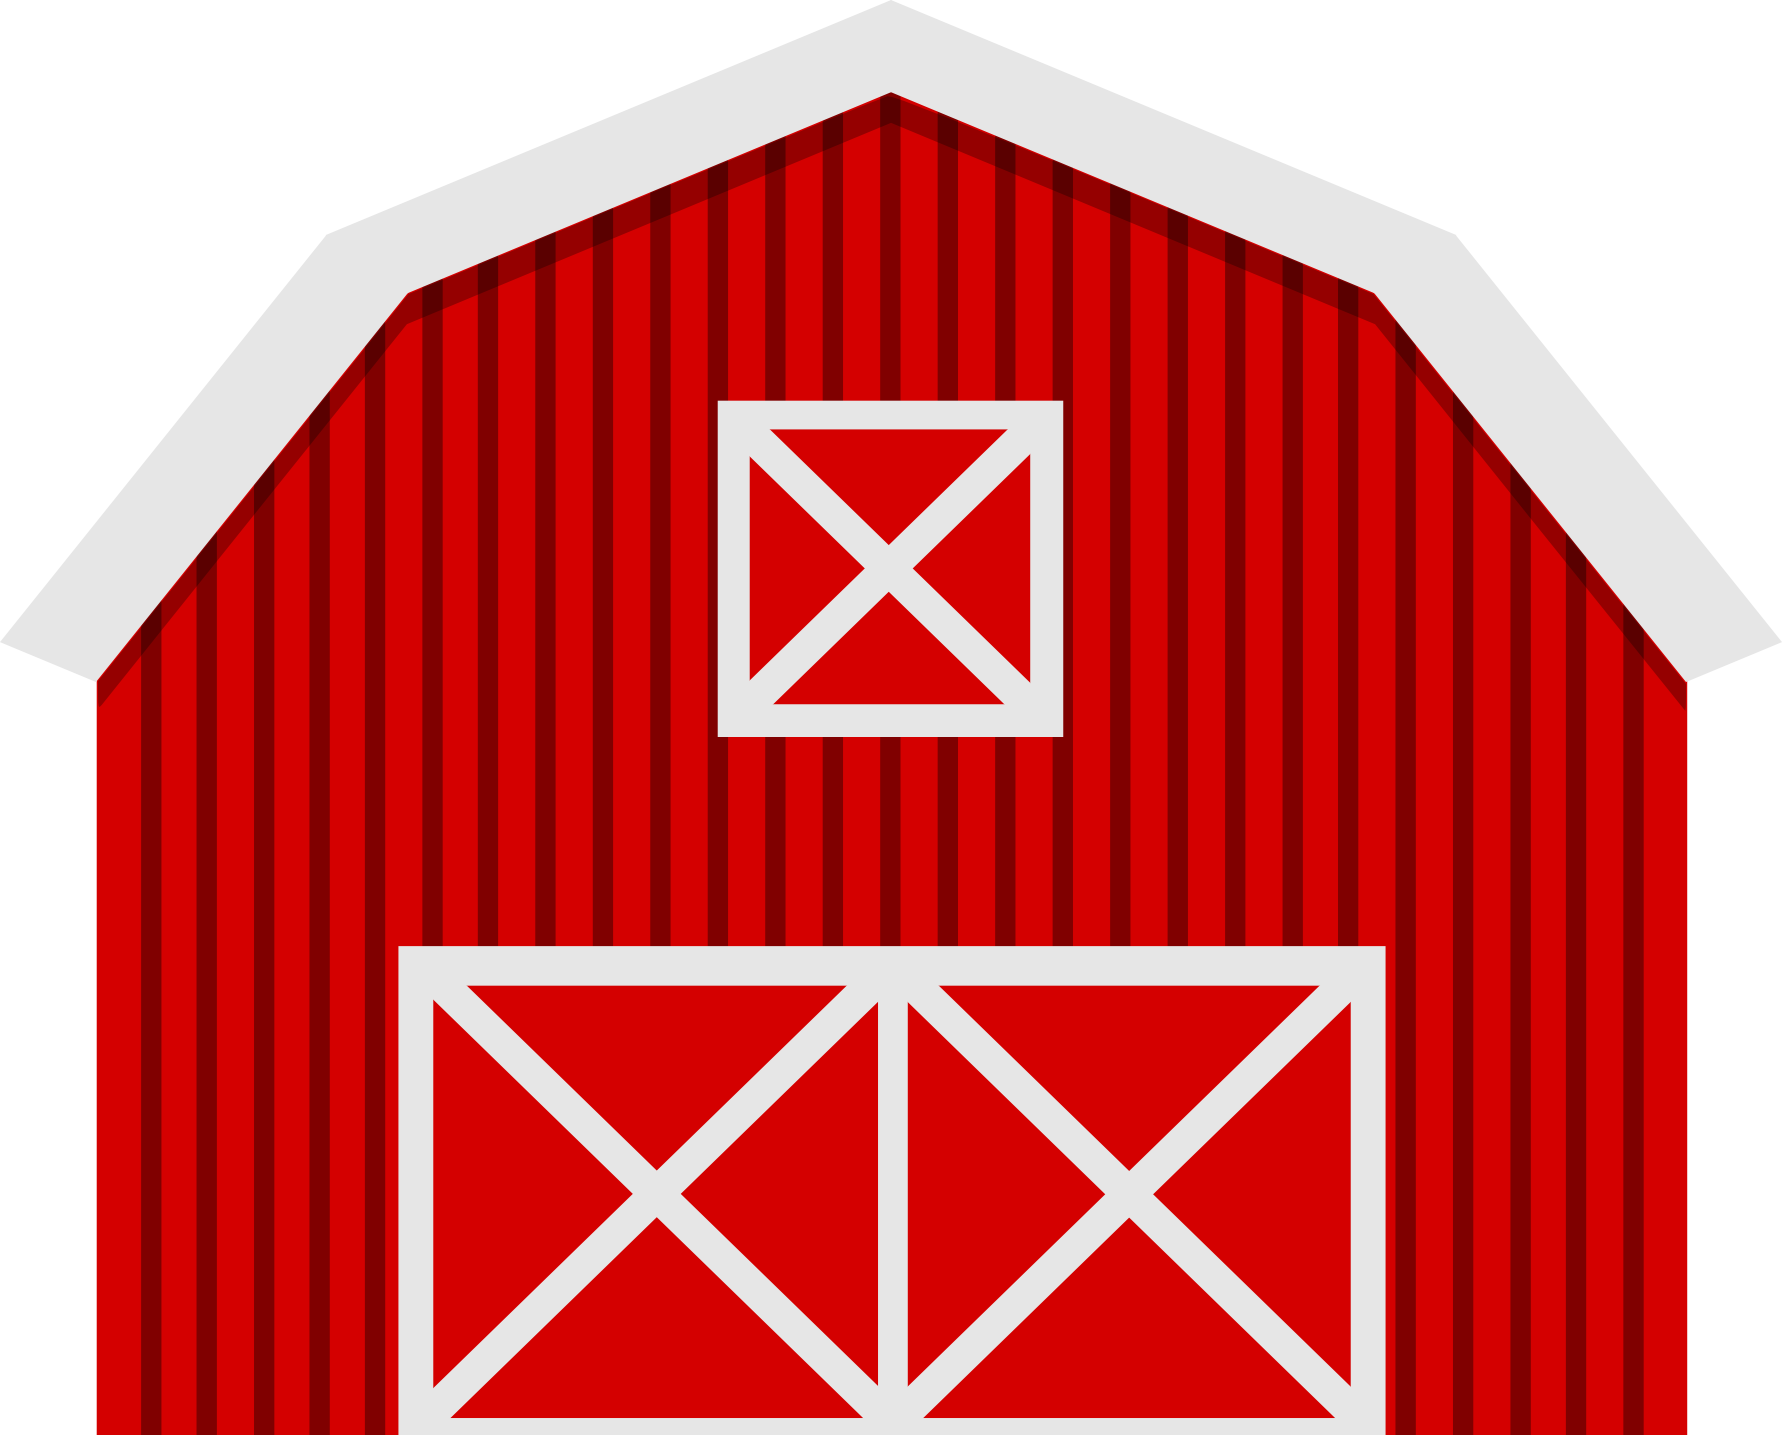 1782x1435 Black And White Cartoon Barn Clip Art Vector